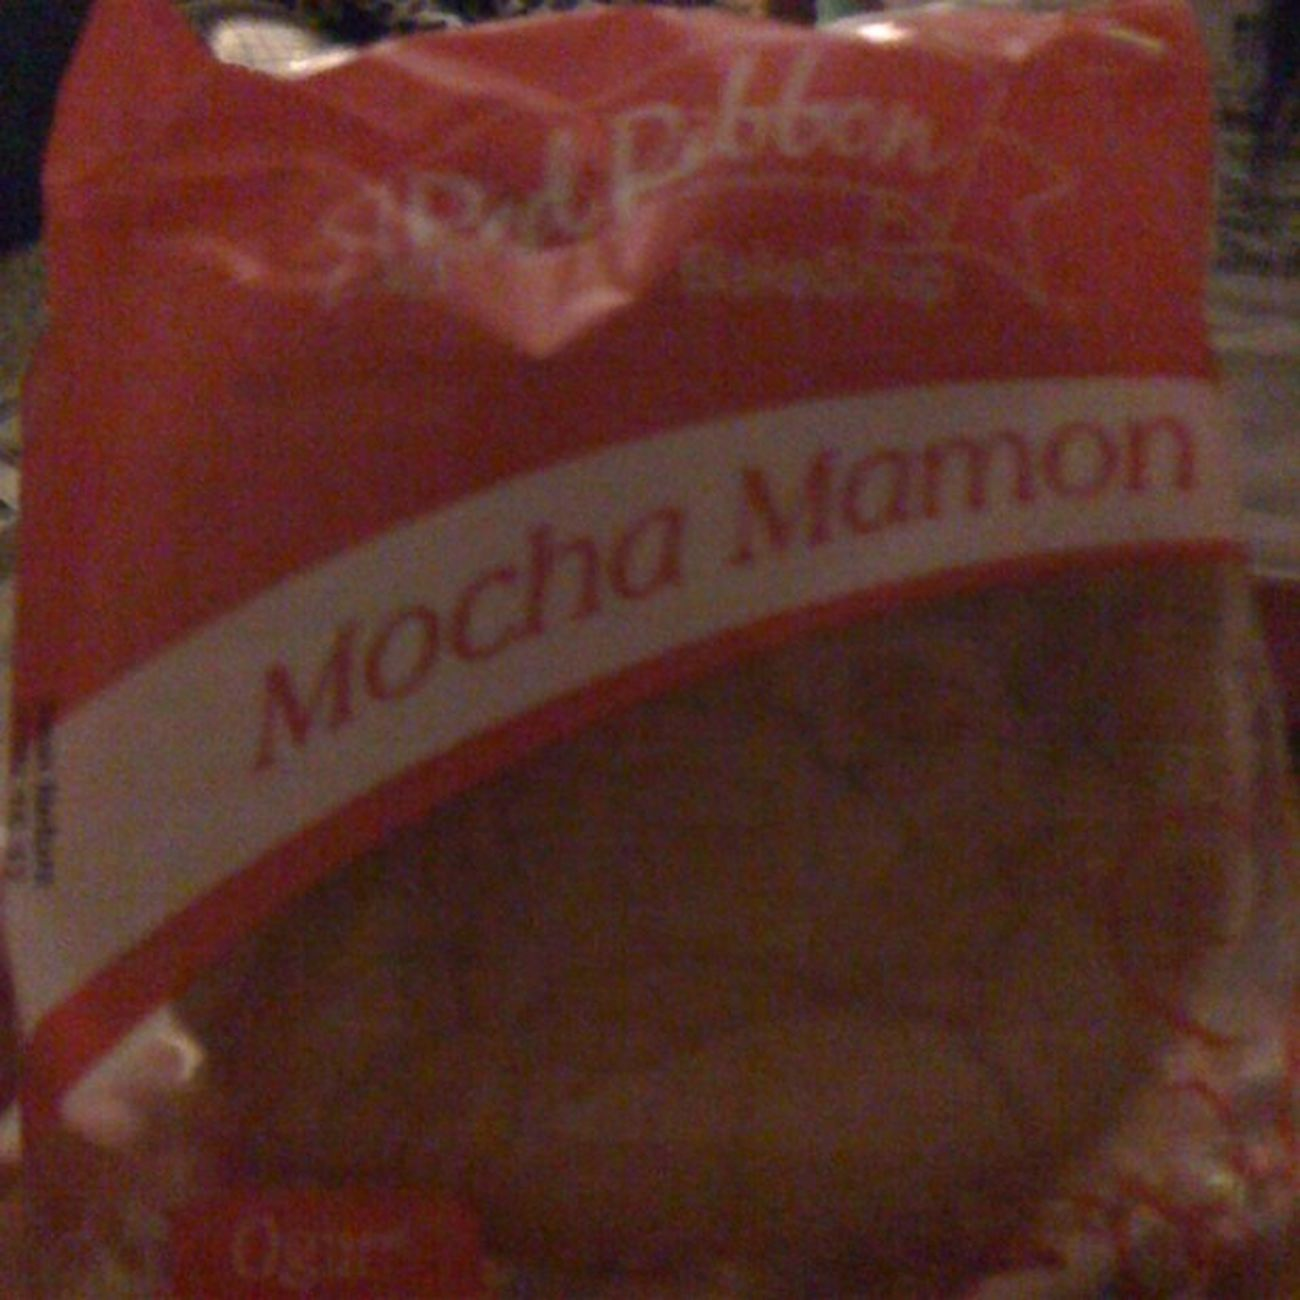 Late night snack! Redribbon Mocha Mamon